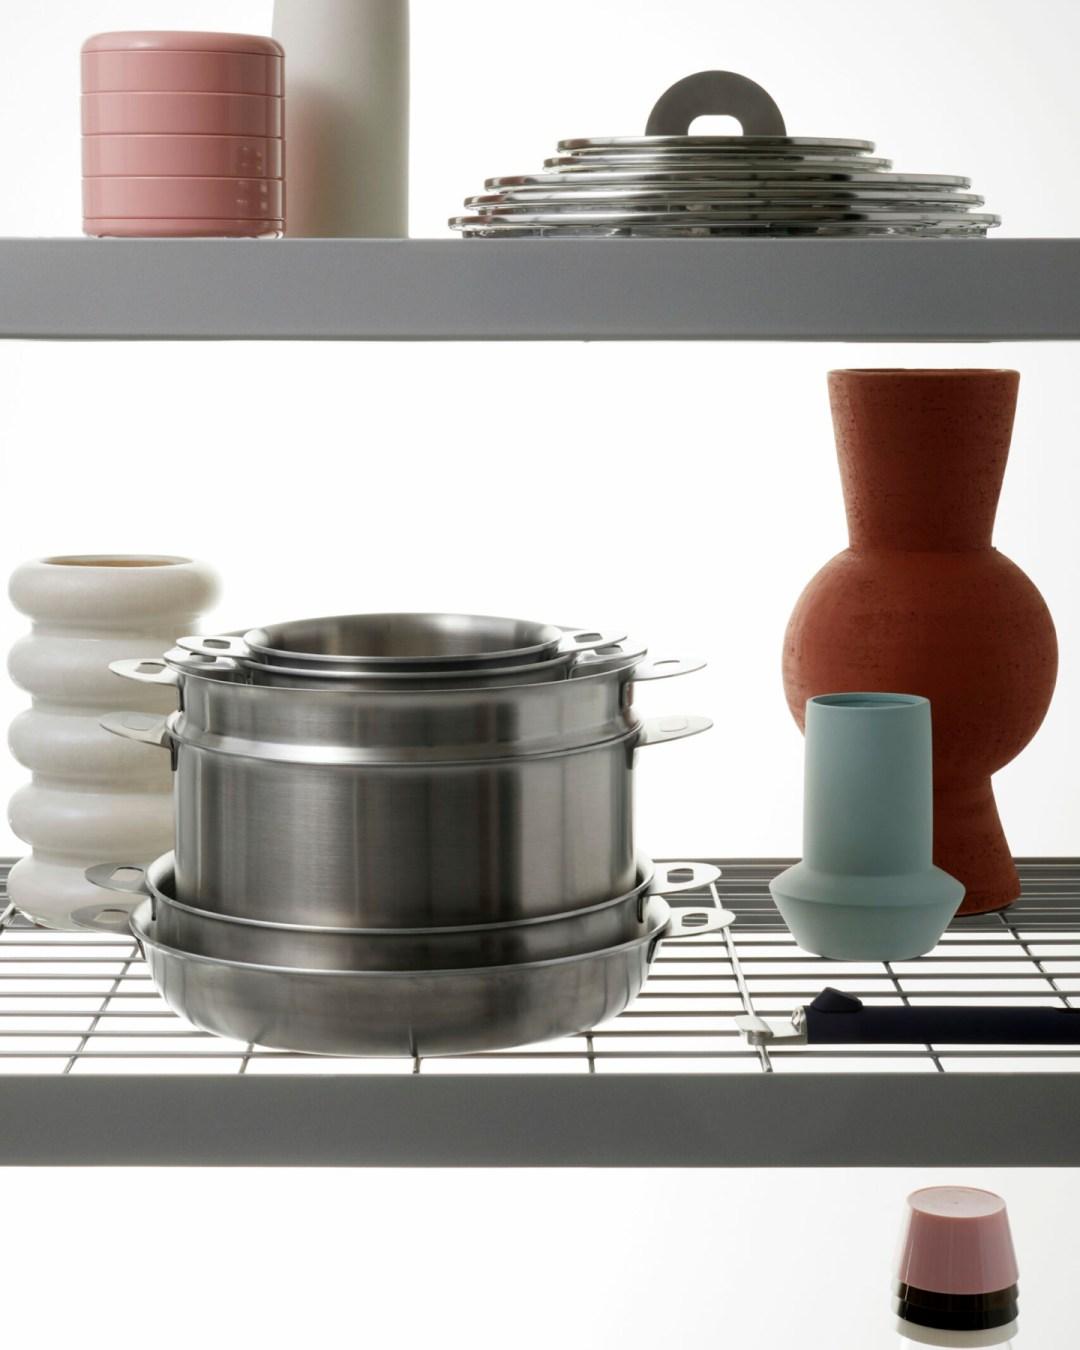 ENSEMBL Stackware cookware and lids